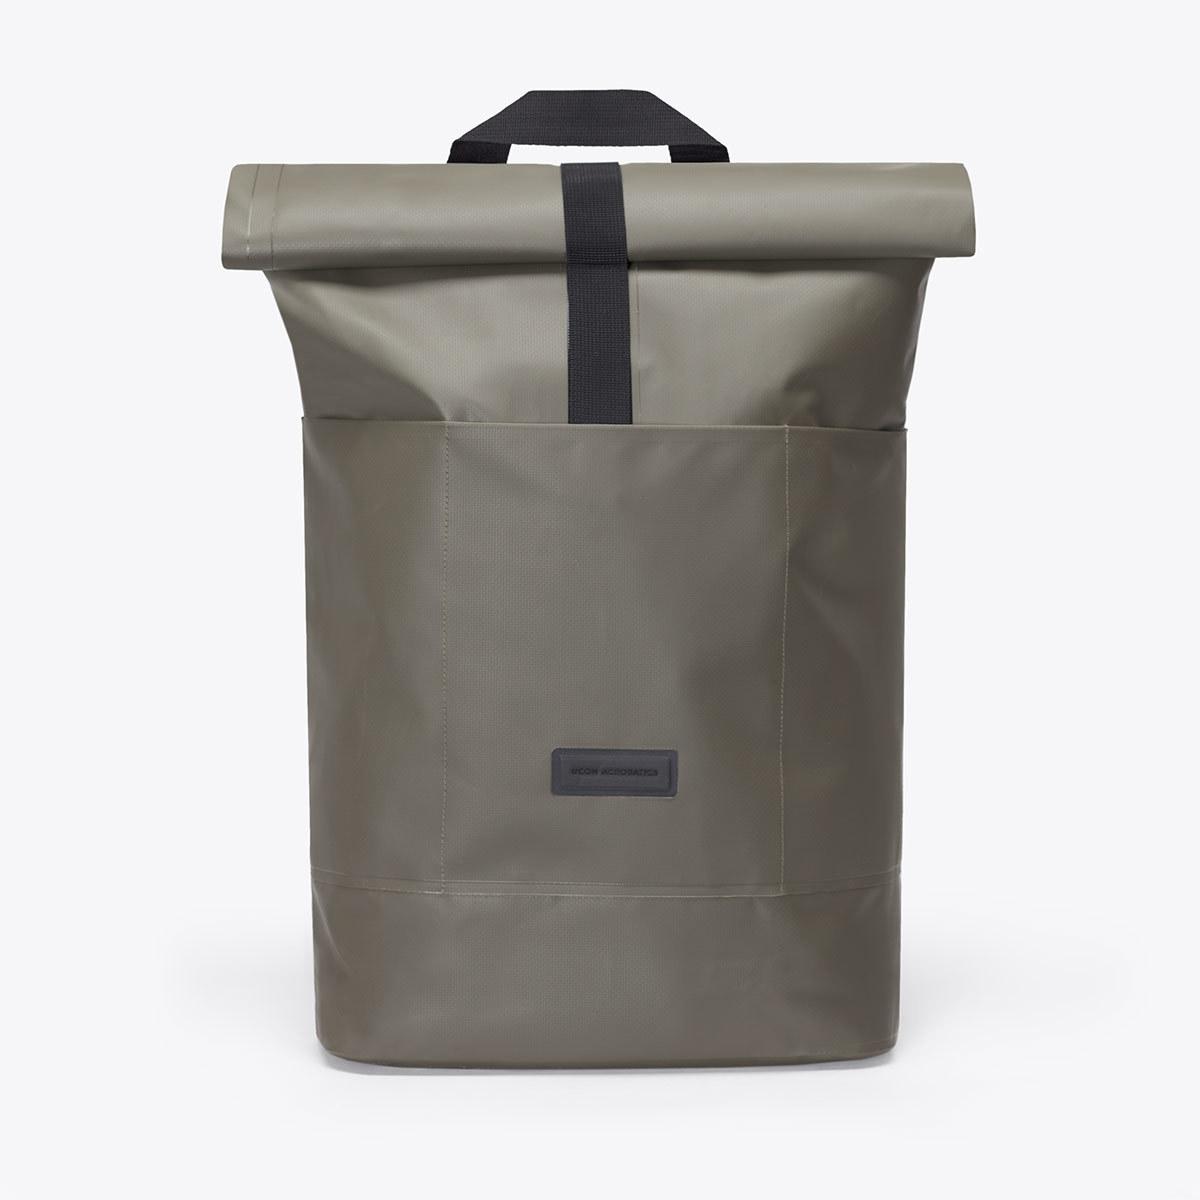 UA_Hajo-Backpack_Seal-Series_Olive_01.jpg